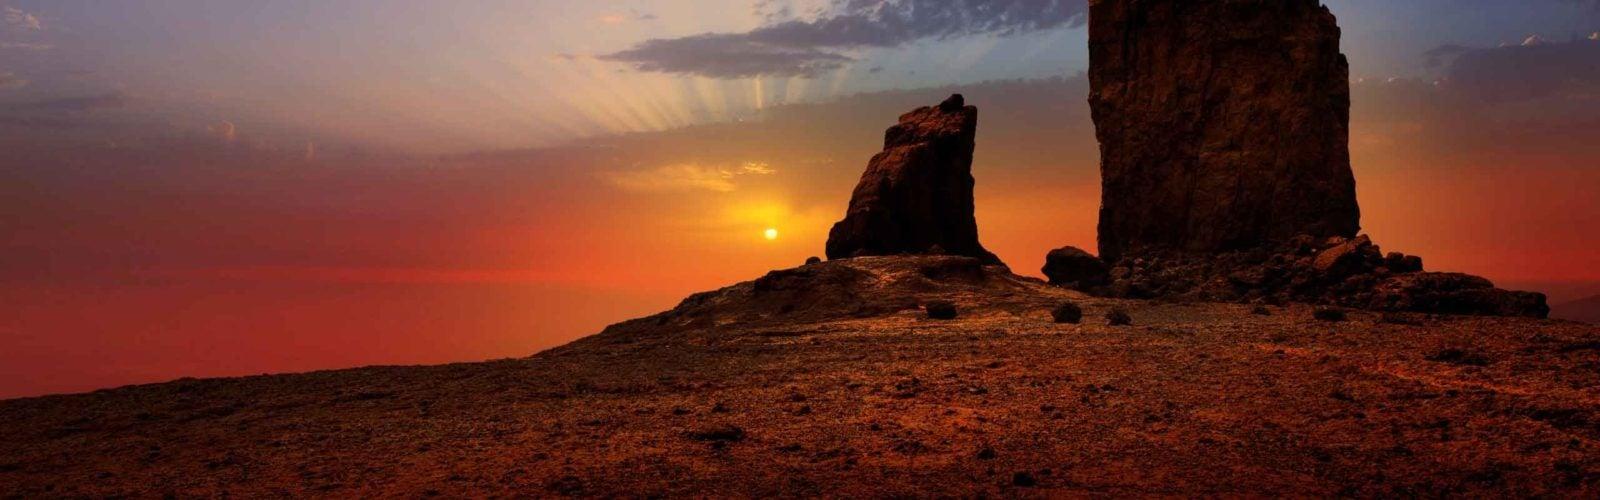 Desert landscape, Gran Canaria, The Canary Islands, Spain